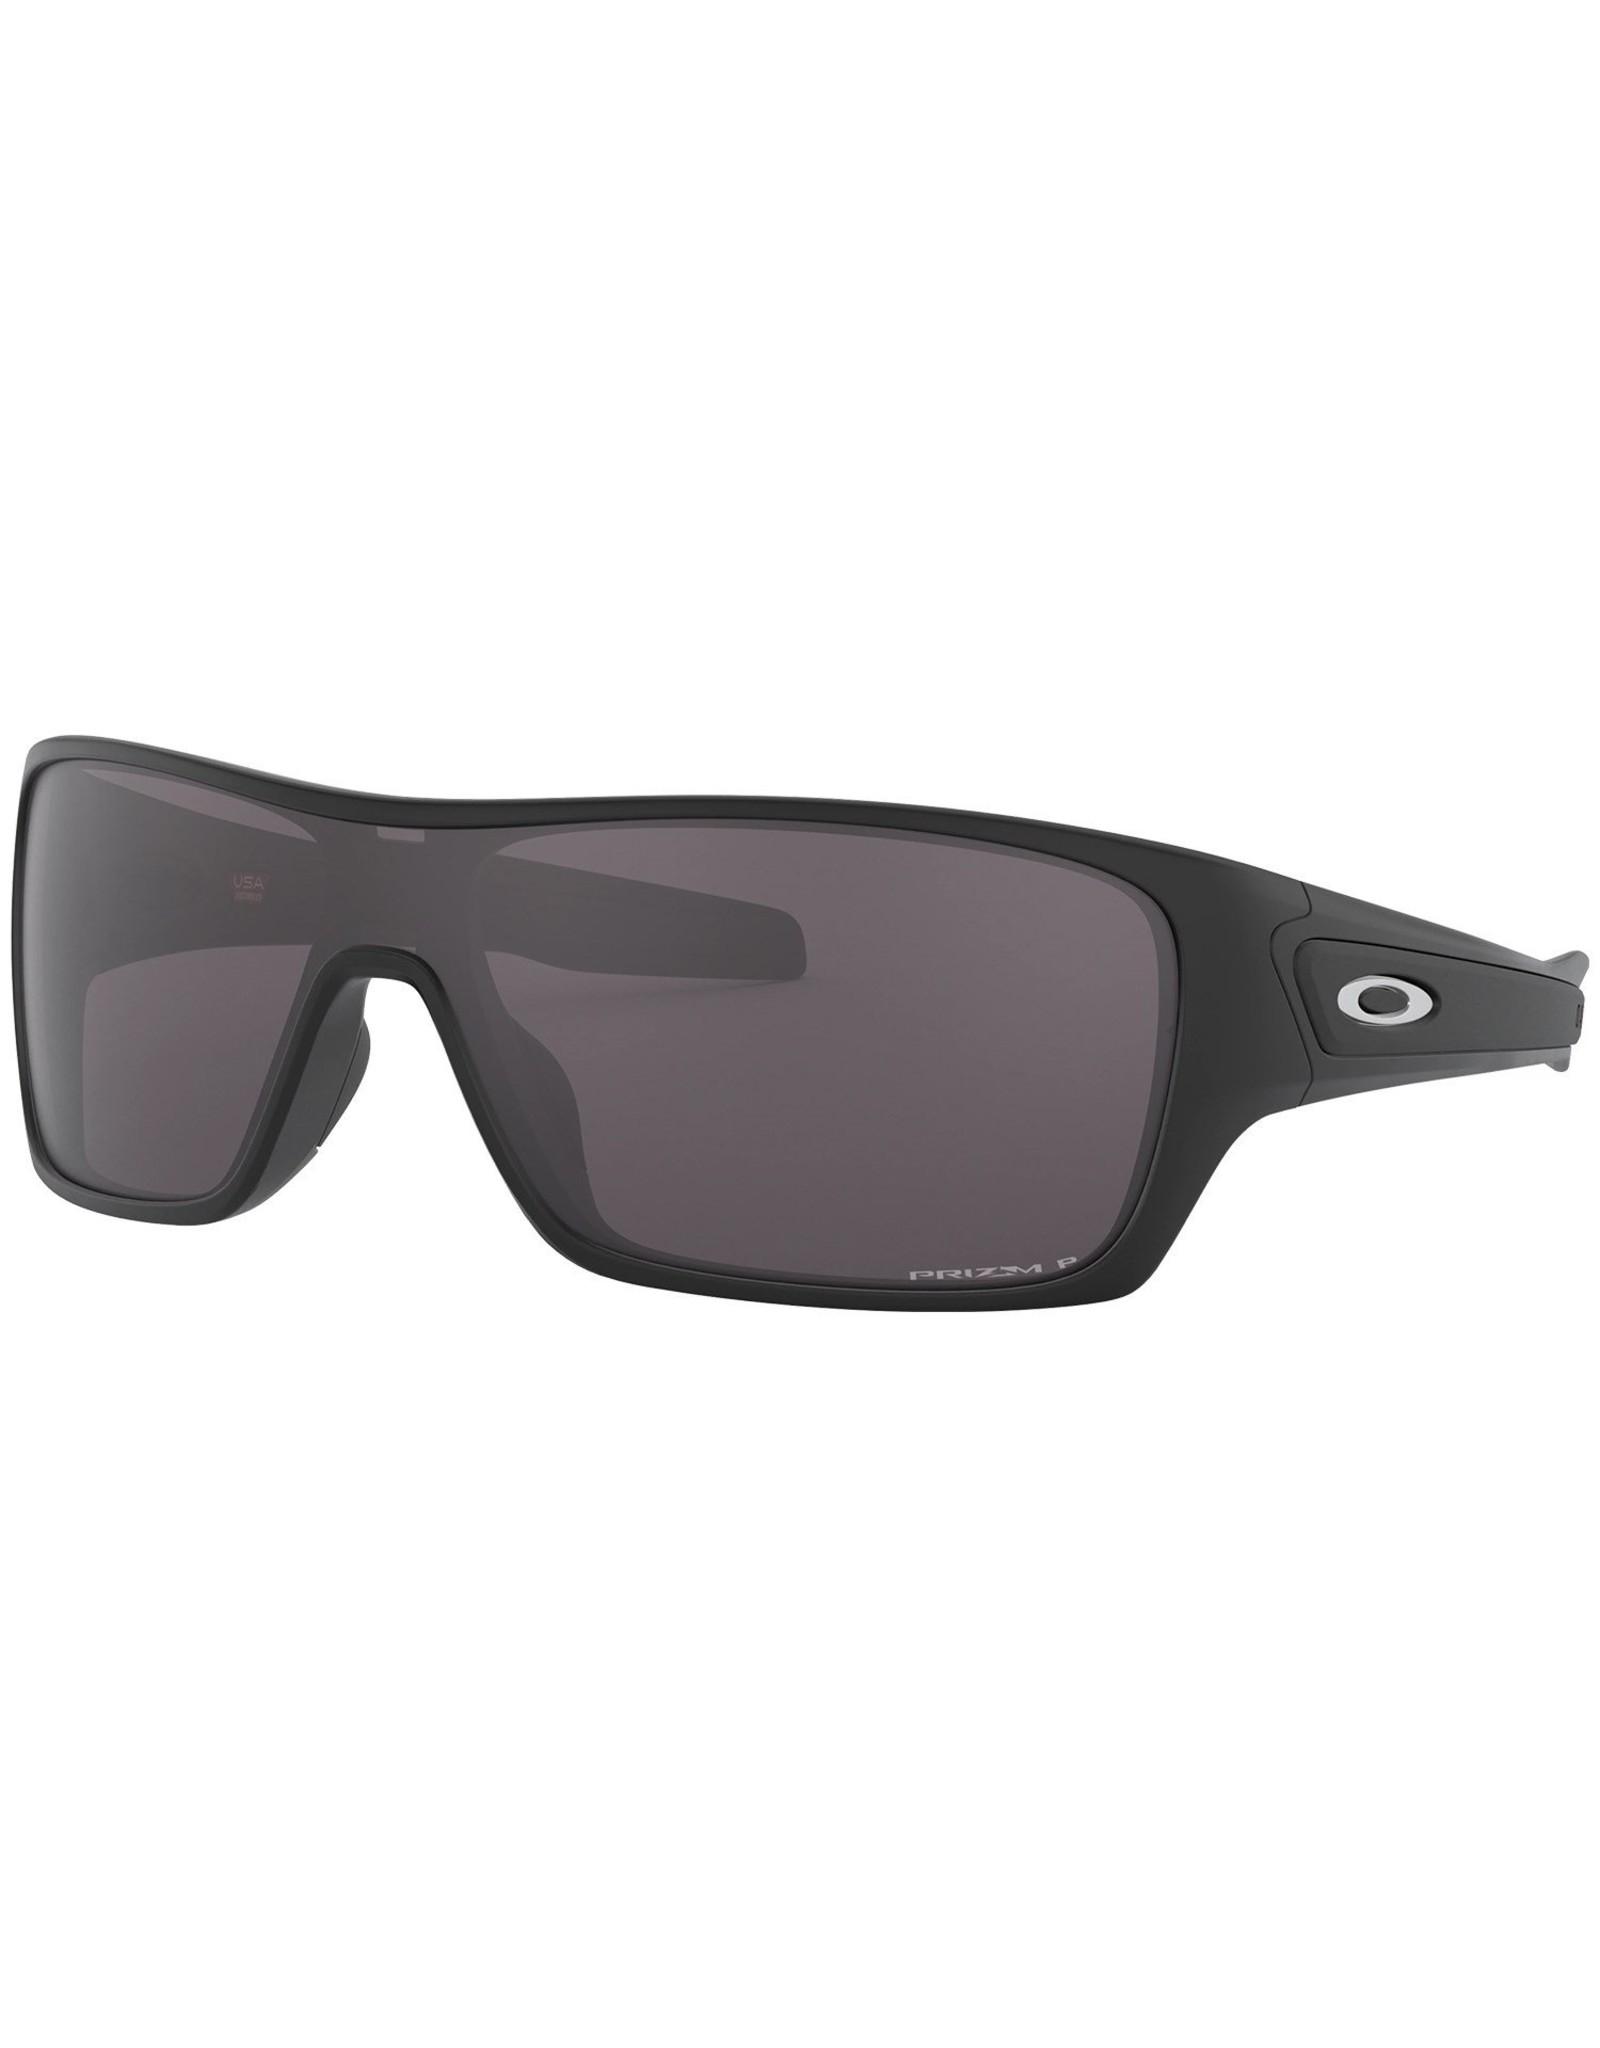 Oakley mens sunglasses TURBINE ROTOR polished black w/ prizm black pol